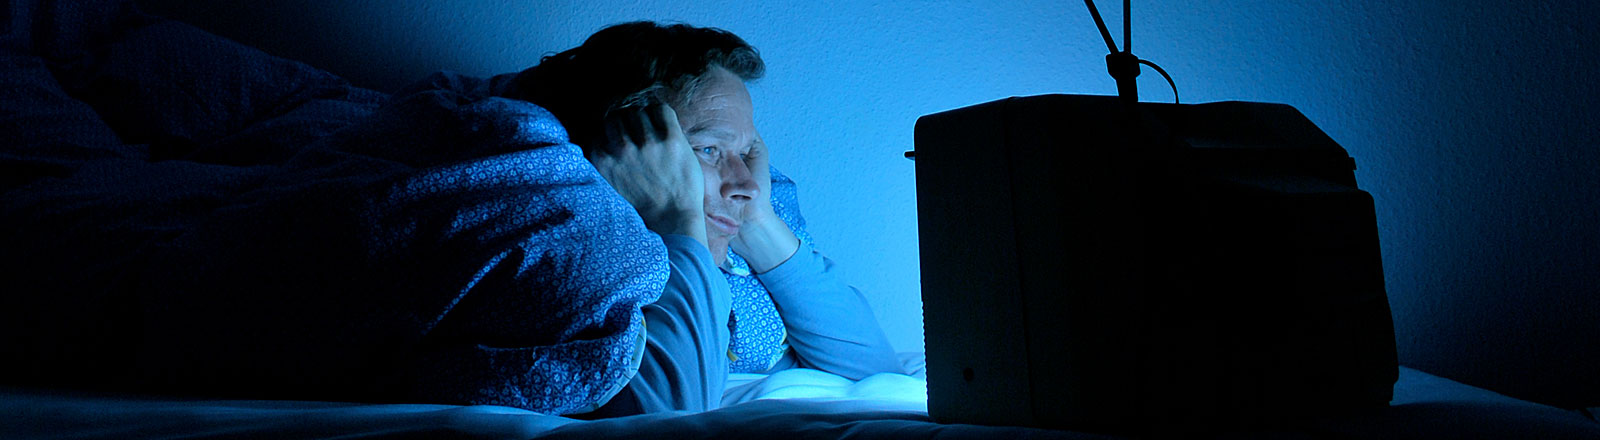 Mann schaut genervt Fernsehen